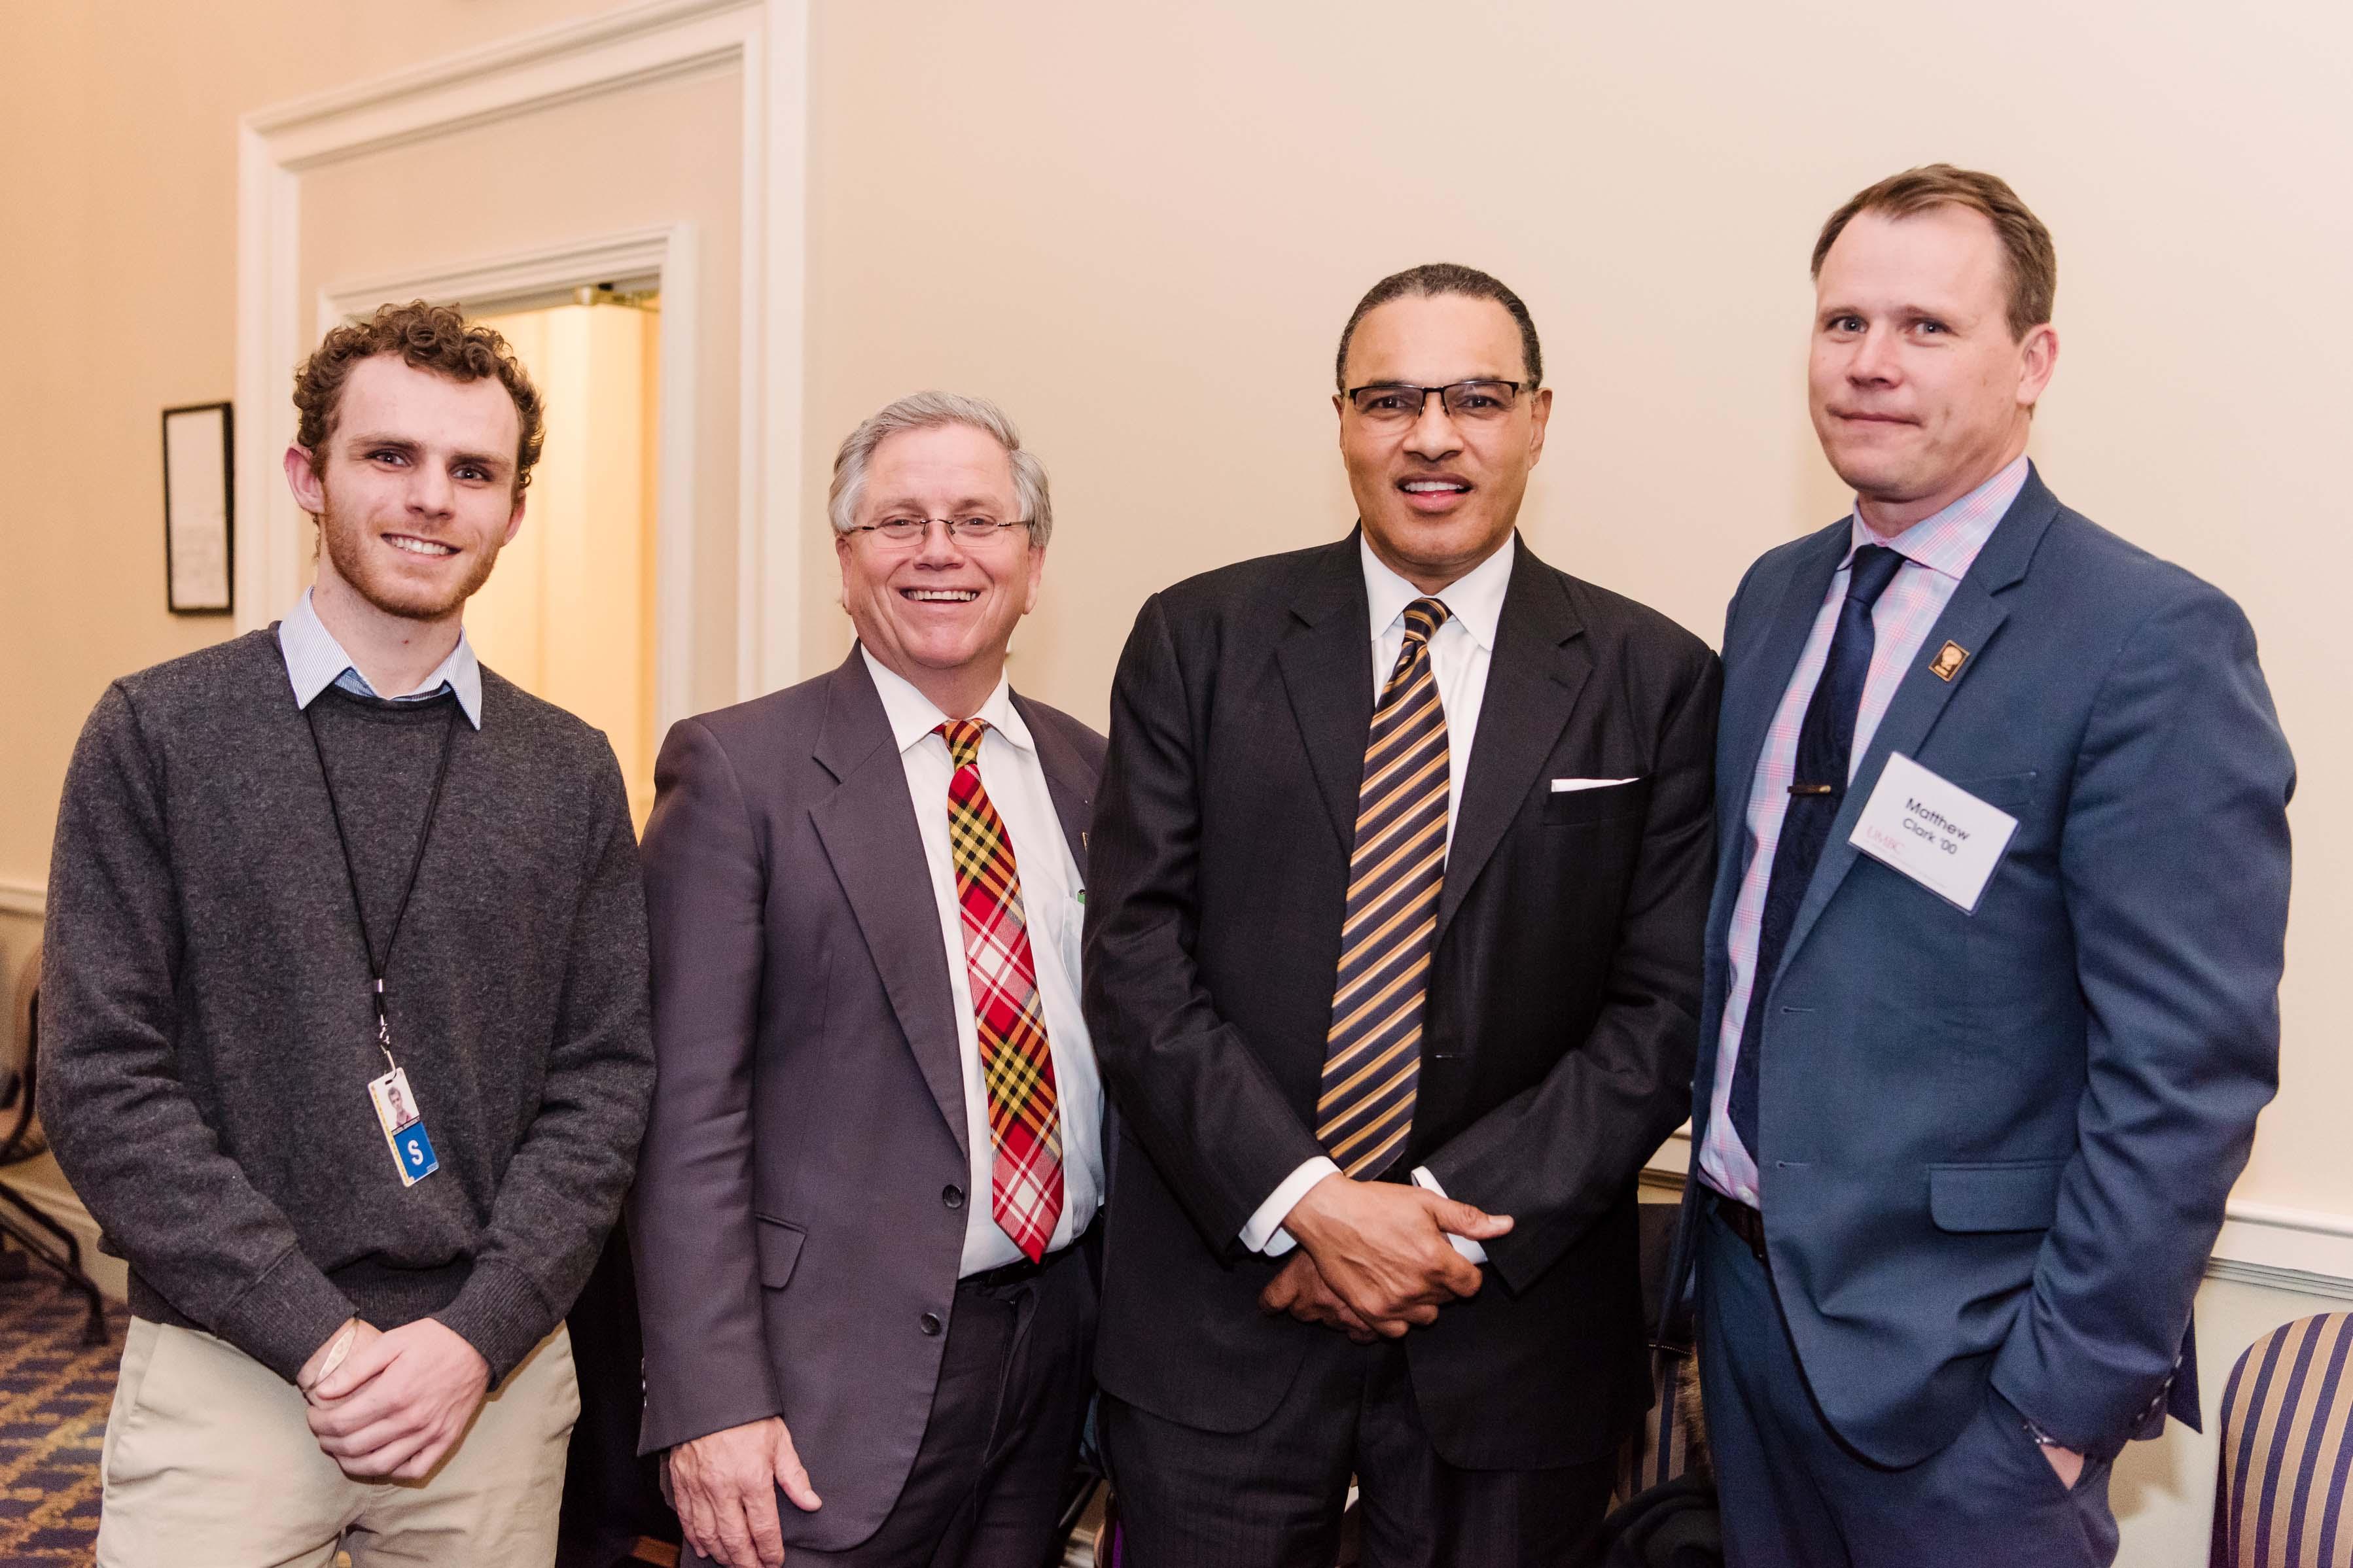 Hrabowski poses with three others at Annapolis alumni reception